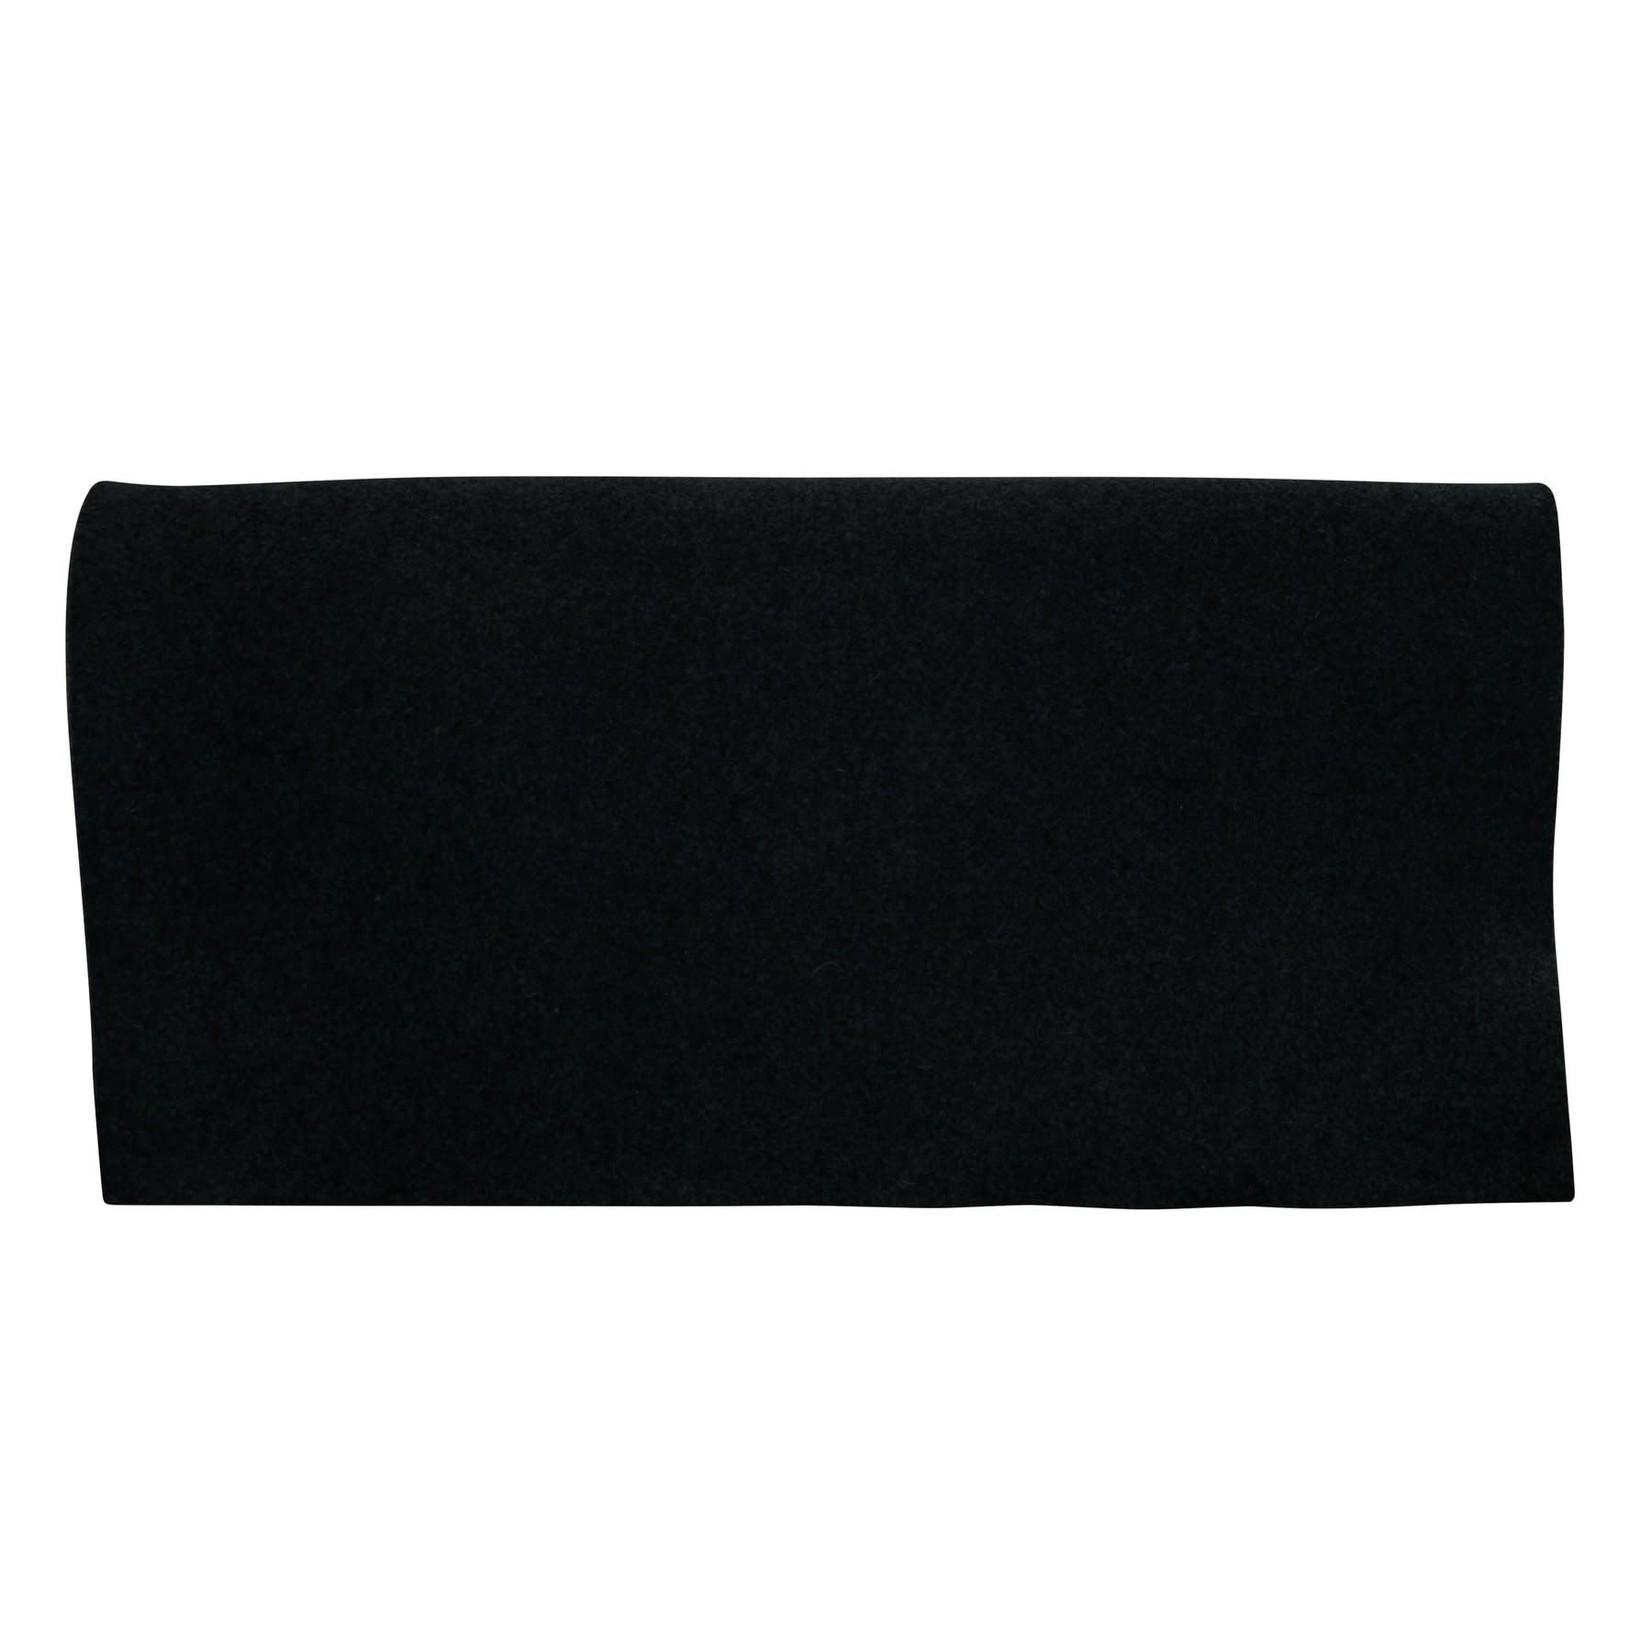 "30x30"" Black Pad Liner"